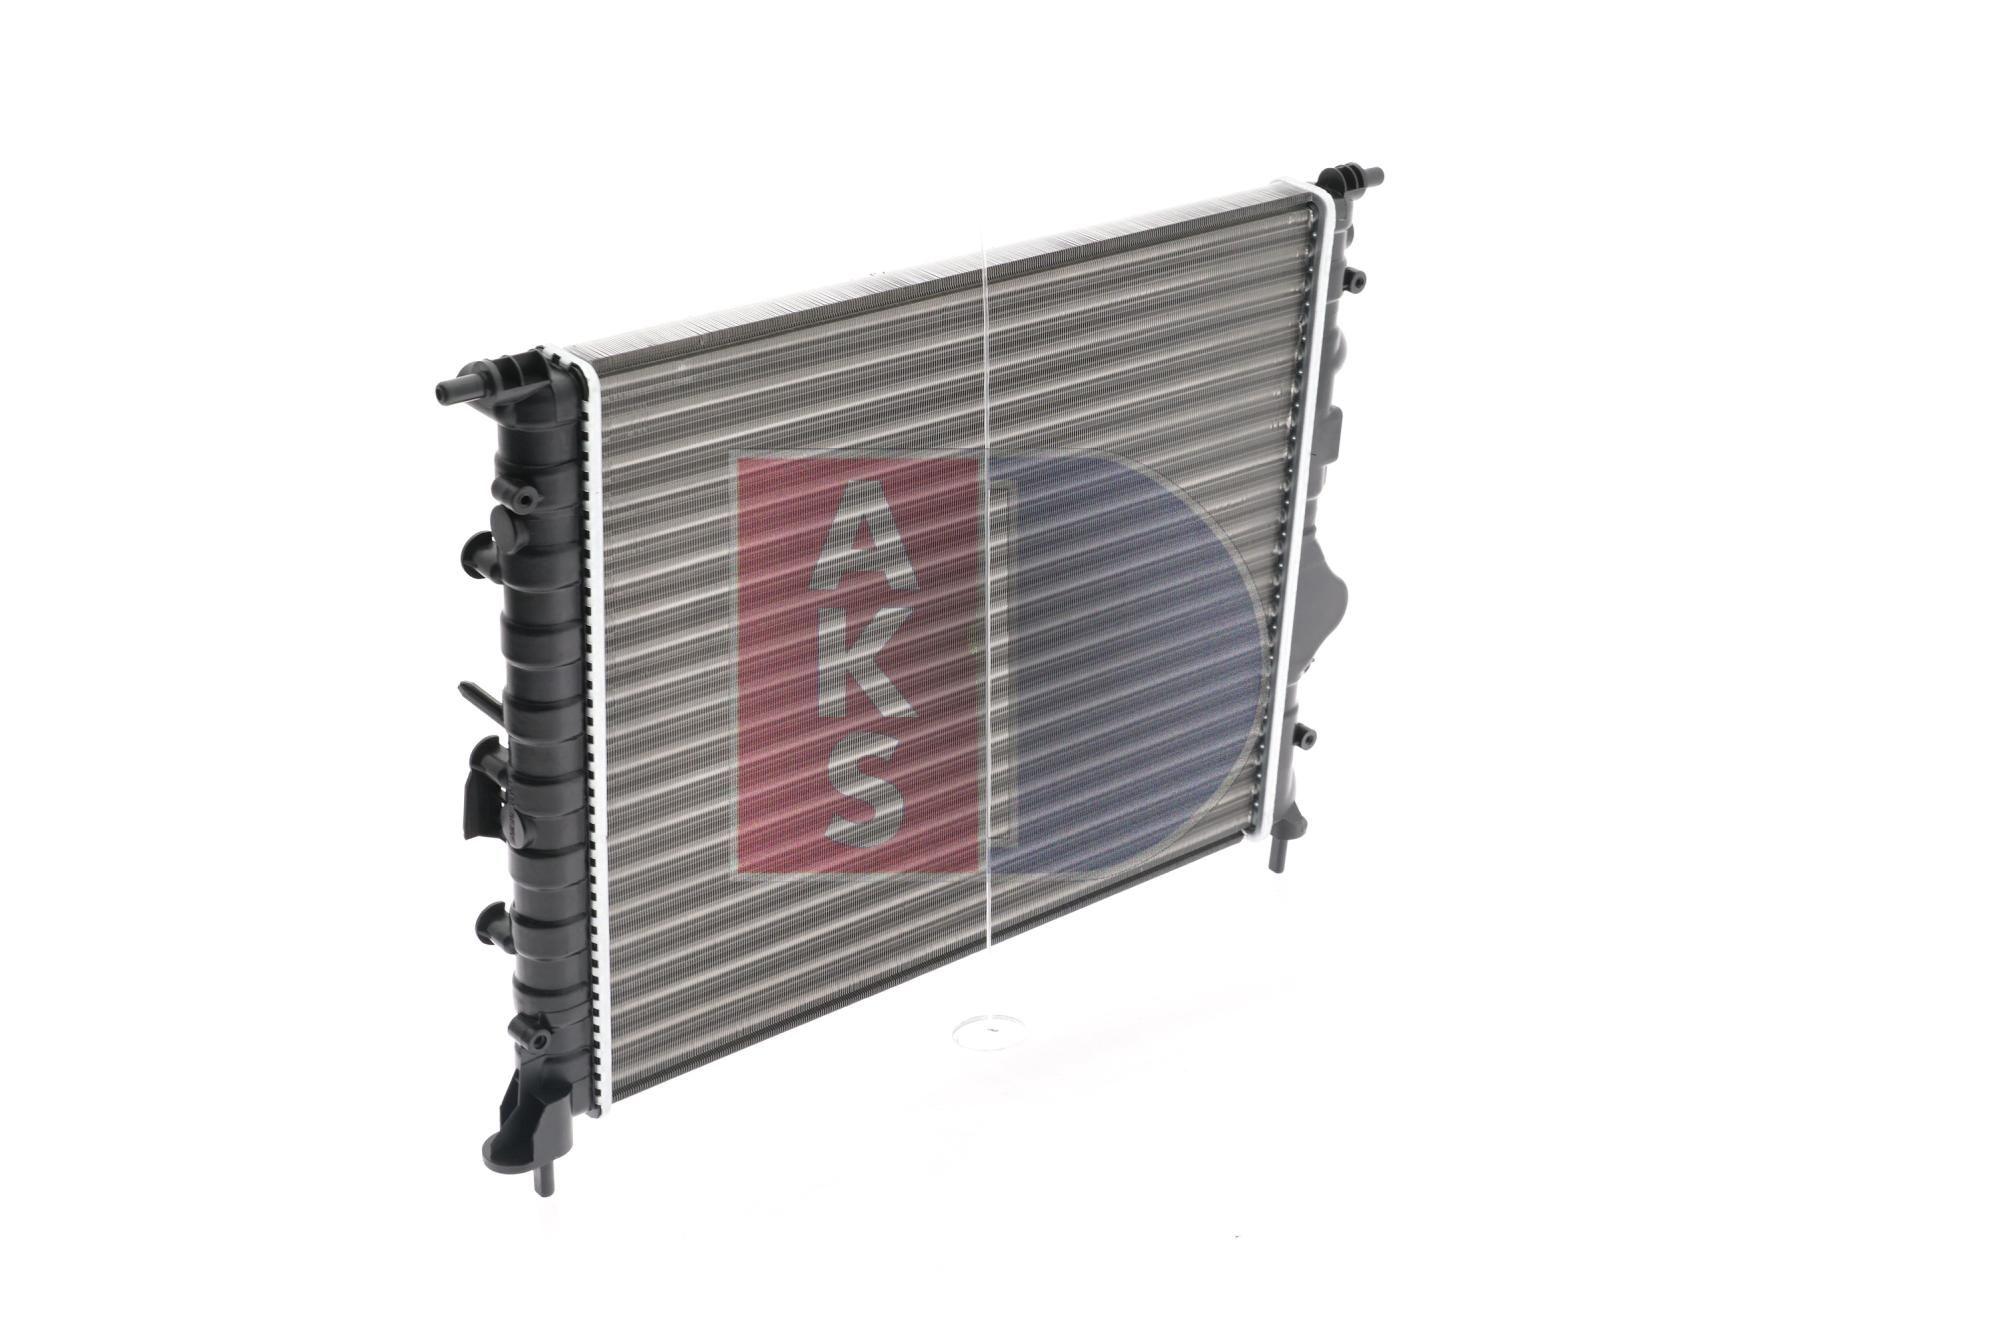 Kühler, Motorkühlung 180240N von AKS DASIS